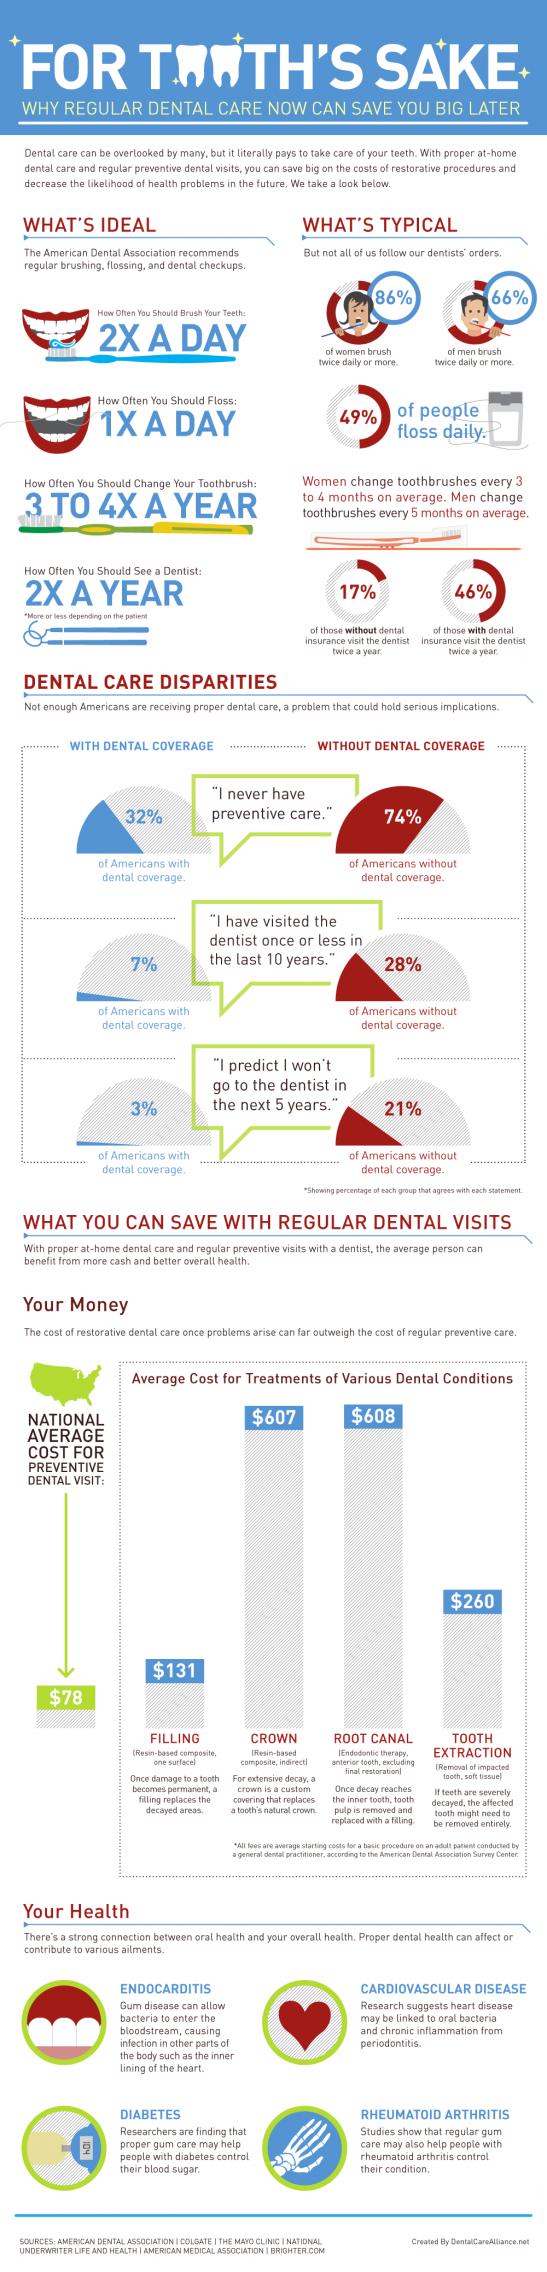 infographic-dental-care-disparities-how-regular-dentist-visits-can-save-you-money_1000-e1358800047973